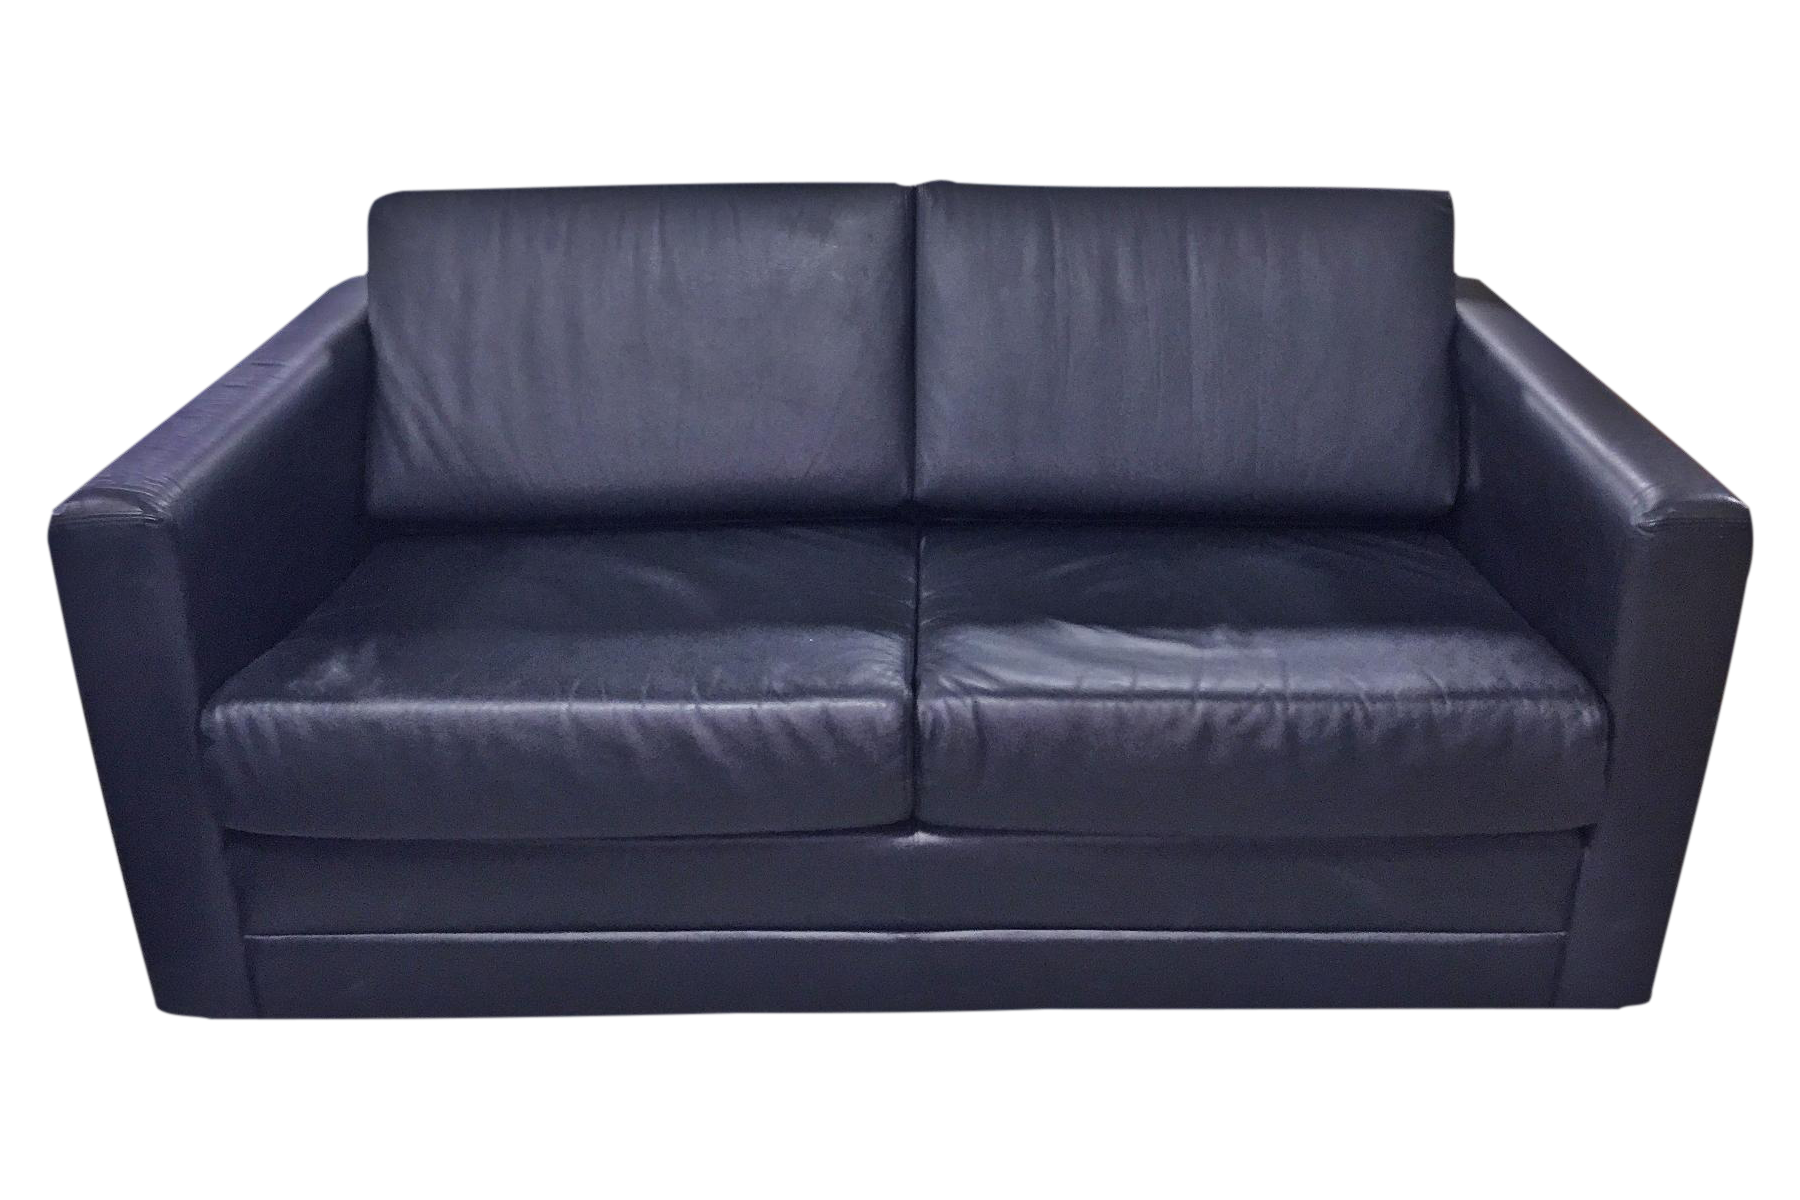 Brayton International Black Leather 2 Seater Sofa